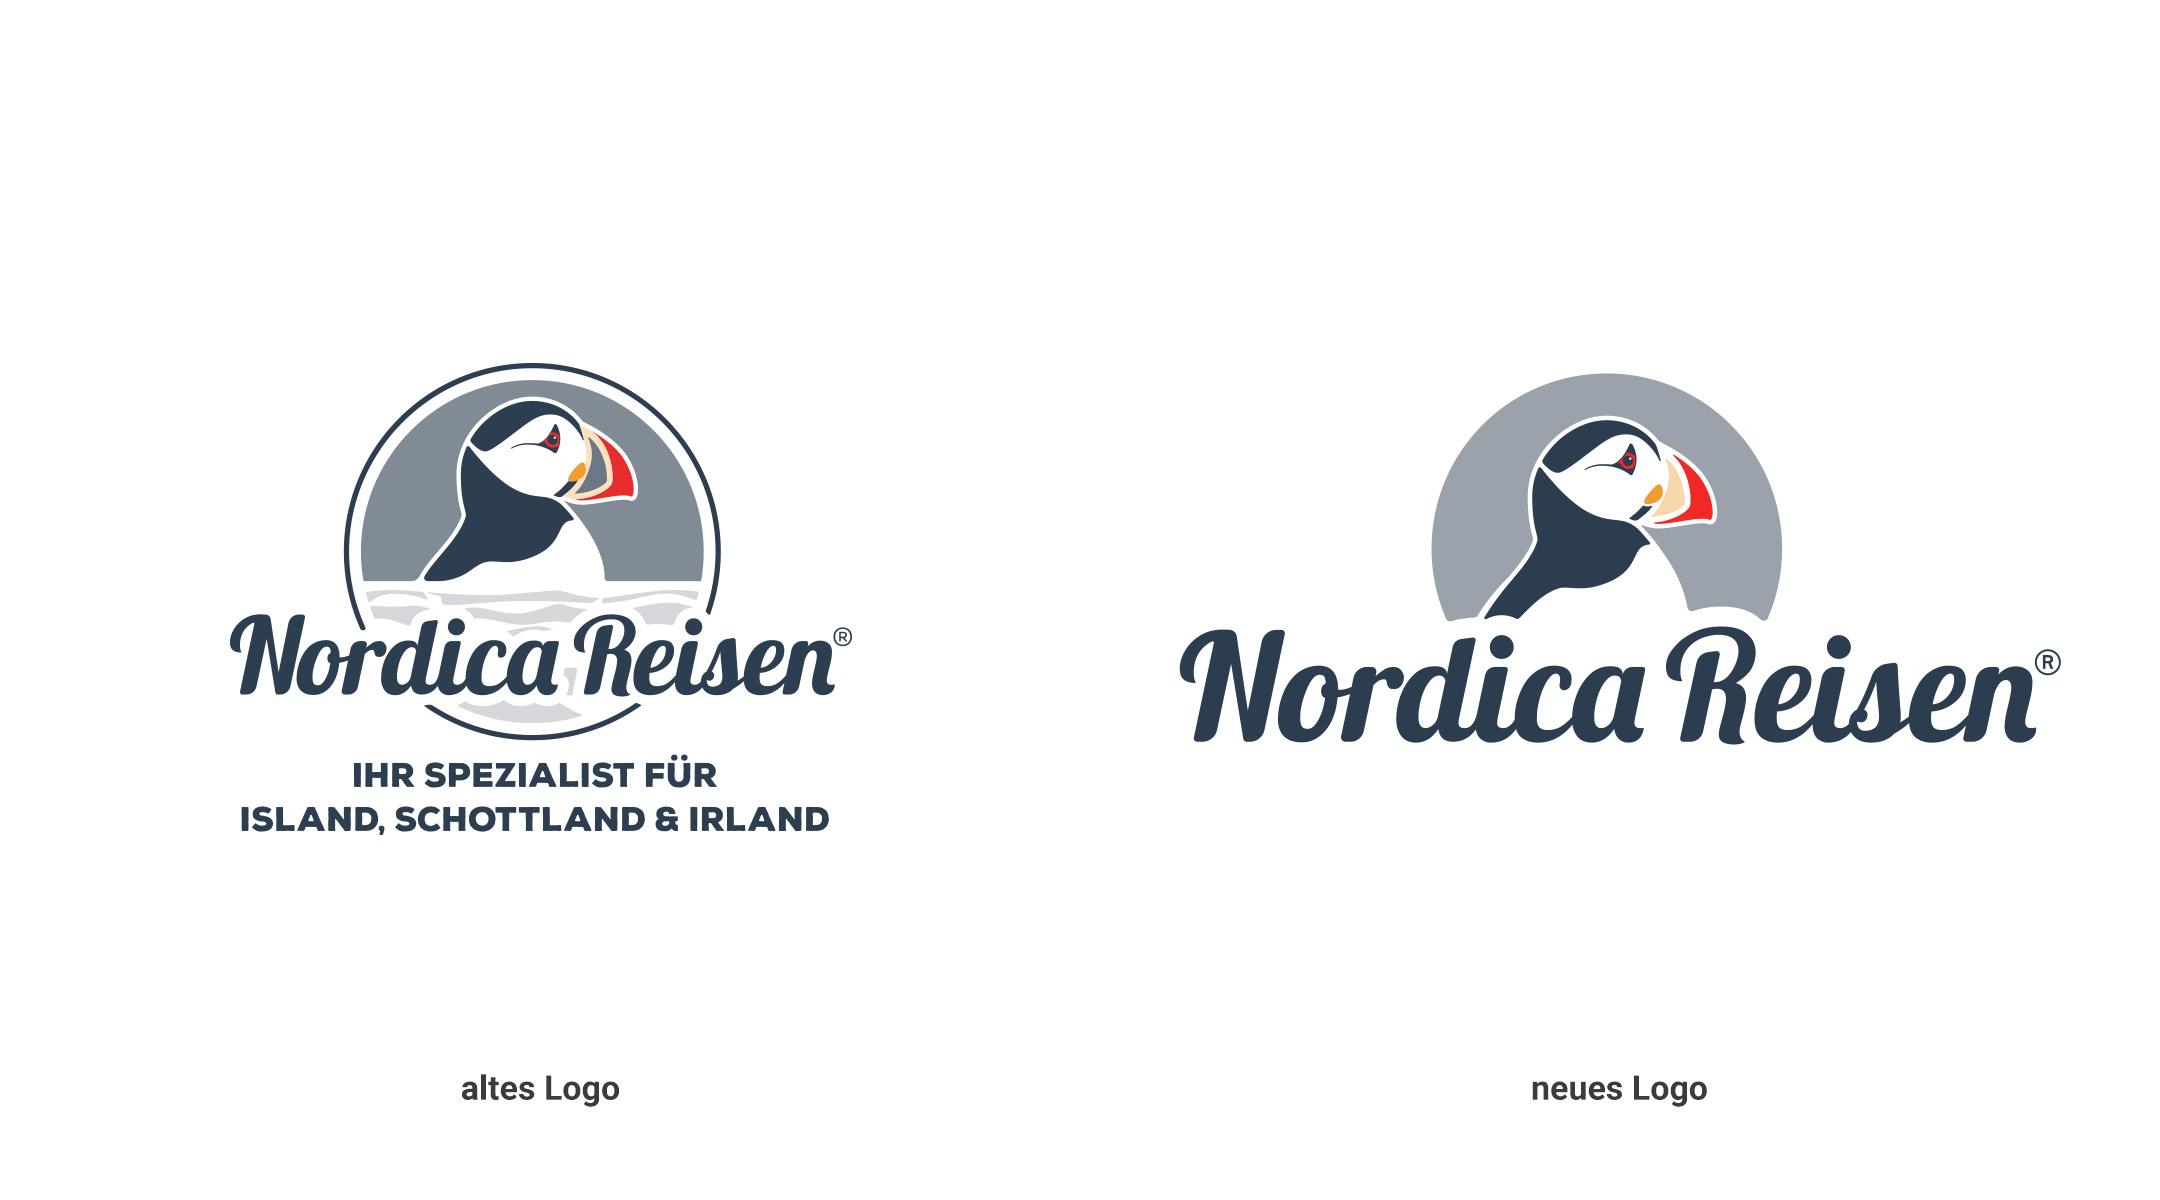 nordica-logos